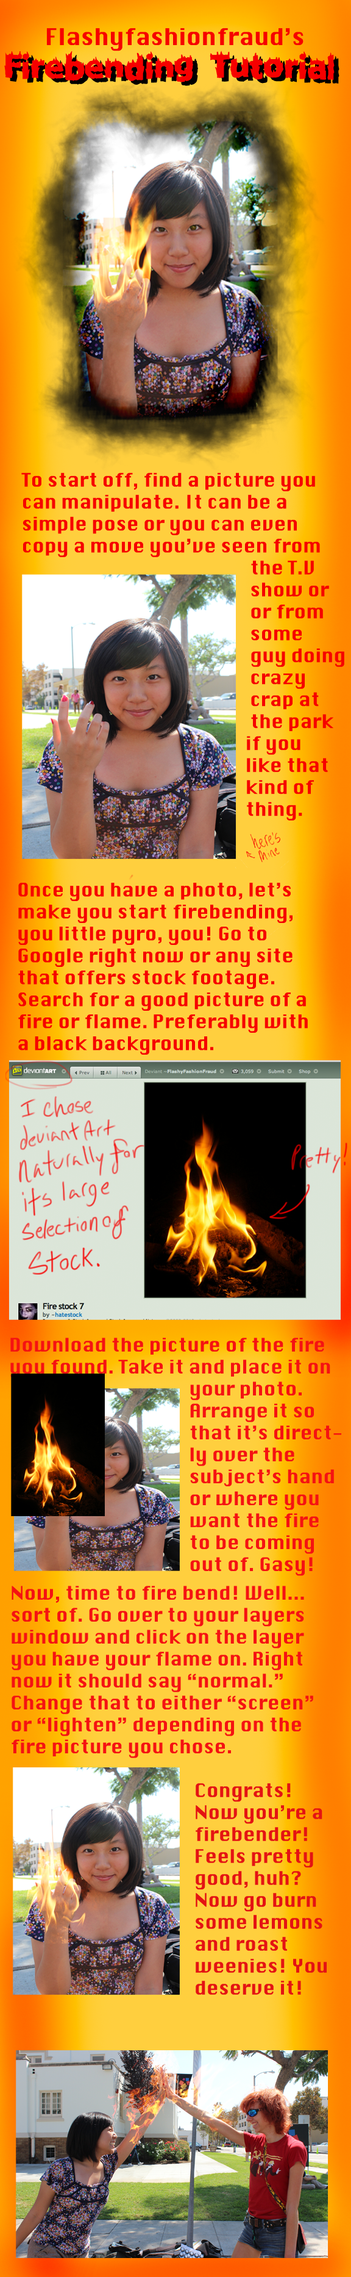 Fire Bending Tutorial by FlashyFashionFraud